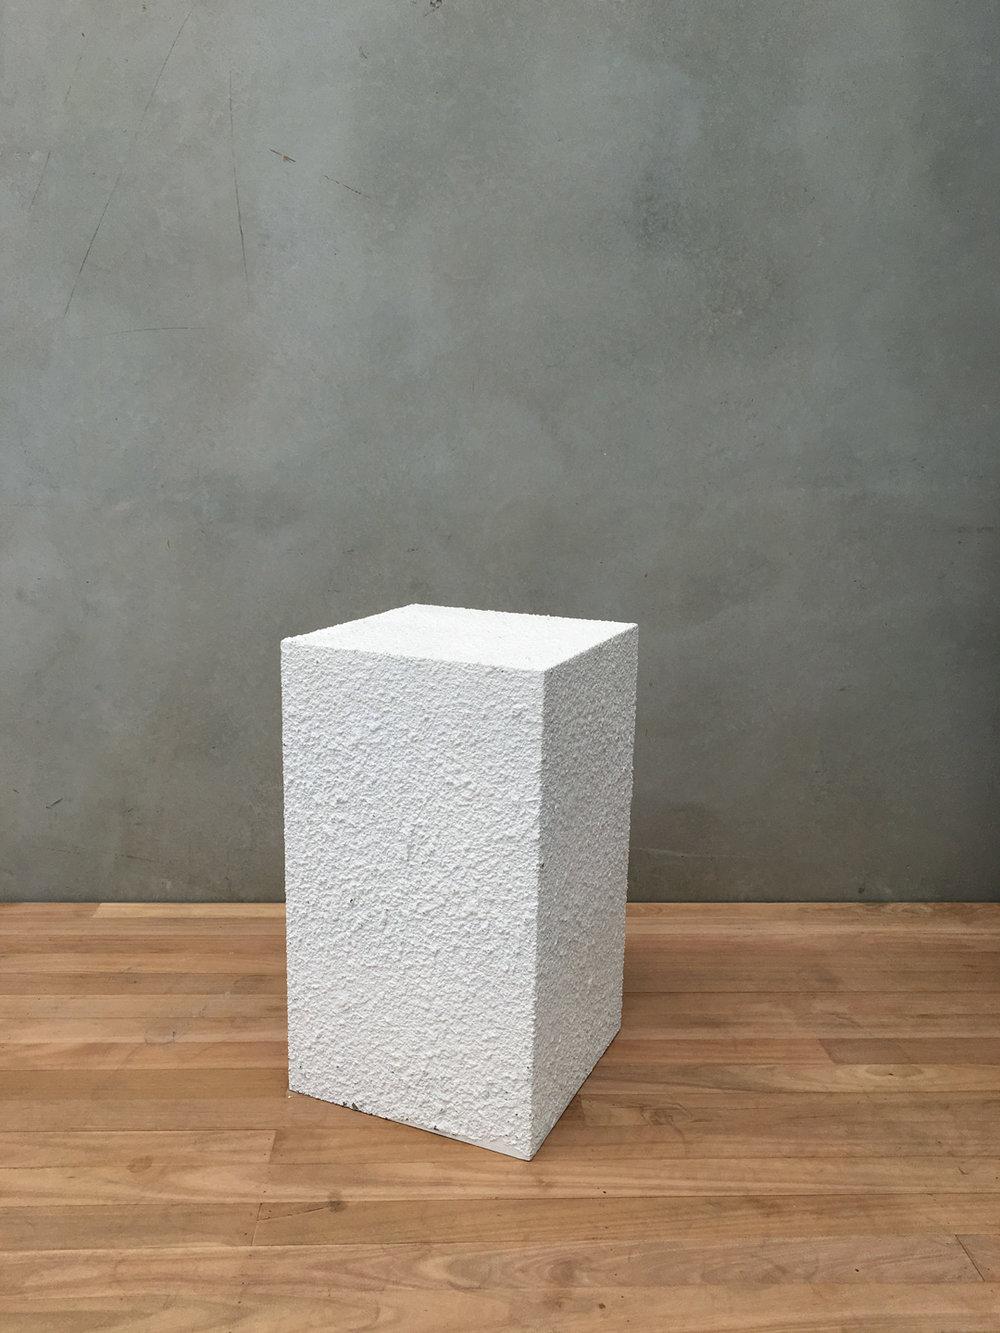 400 X 400 X 700 TEXTURED WHITE